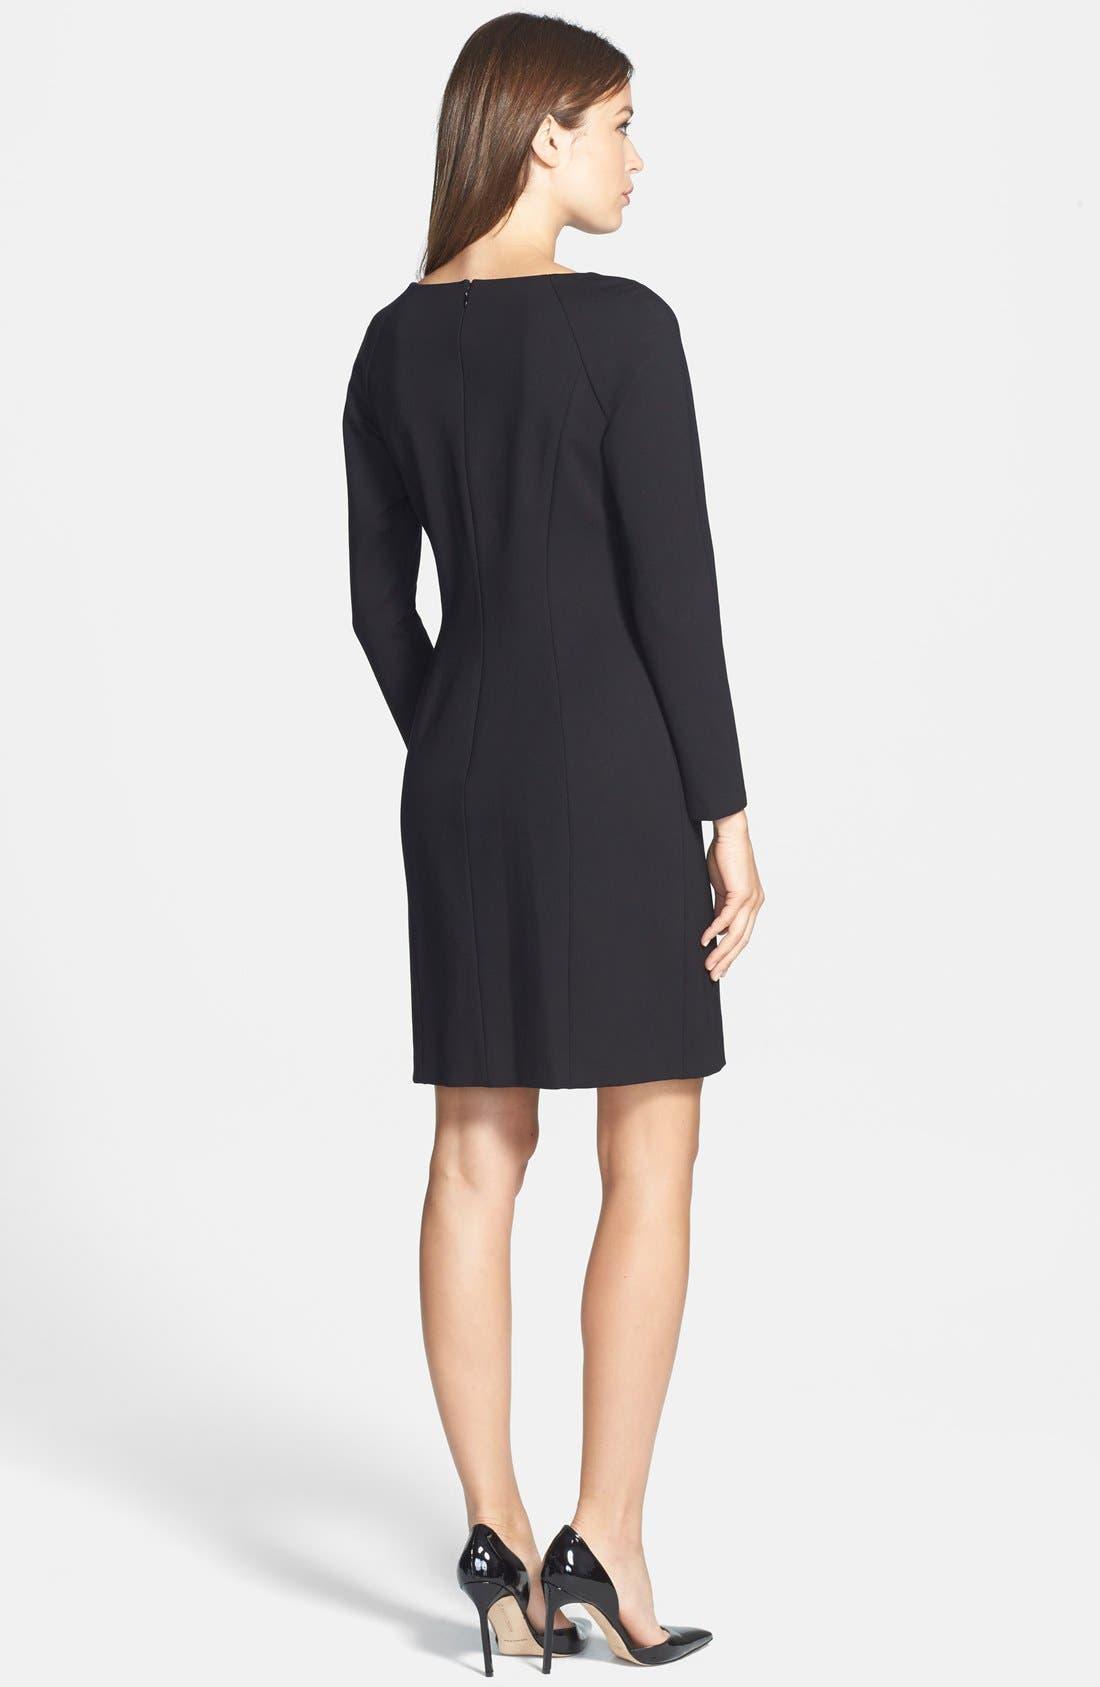 TAHARI, Pleat Detail Long Sleeve Ponte Sheath Dress, Alternate thumbnail 2, color, 001